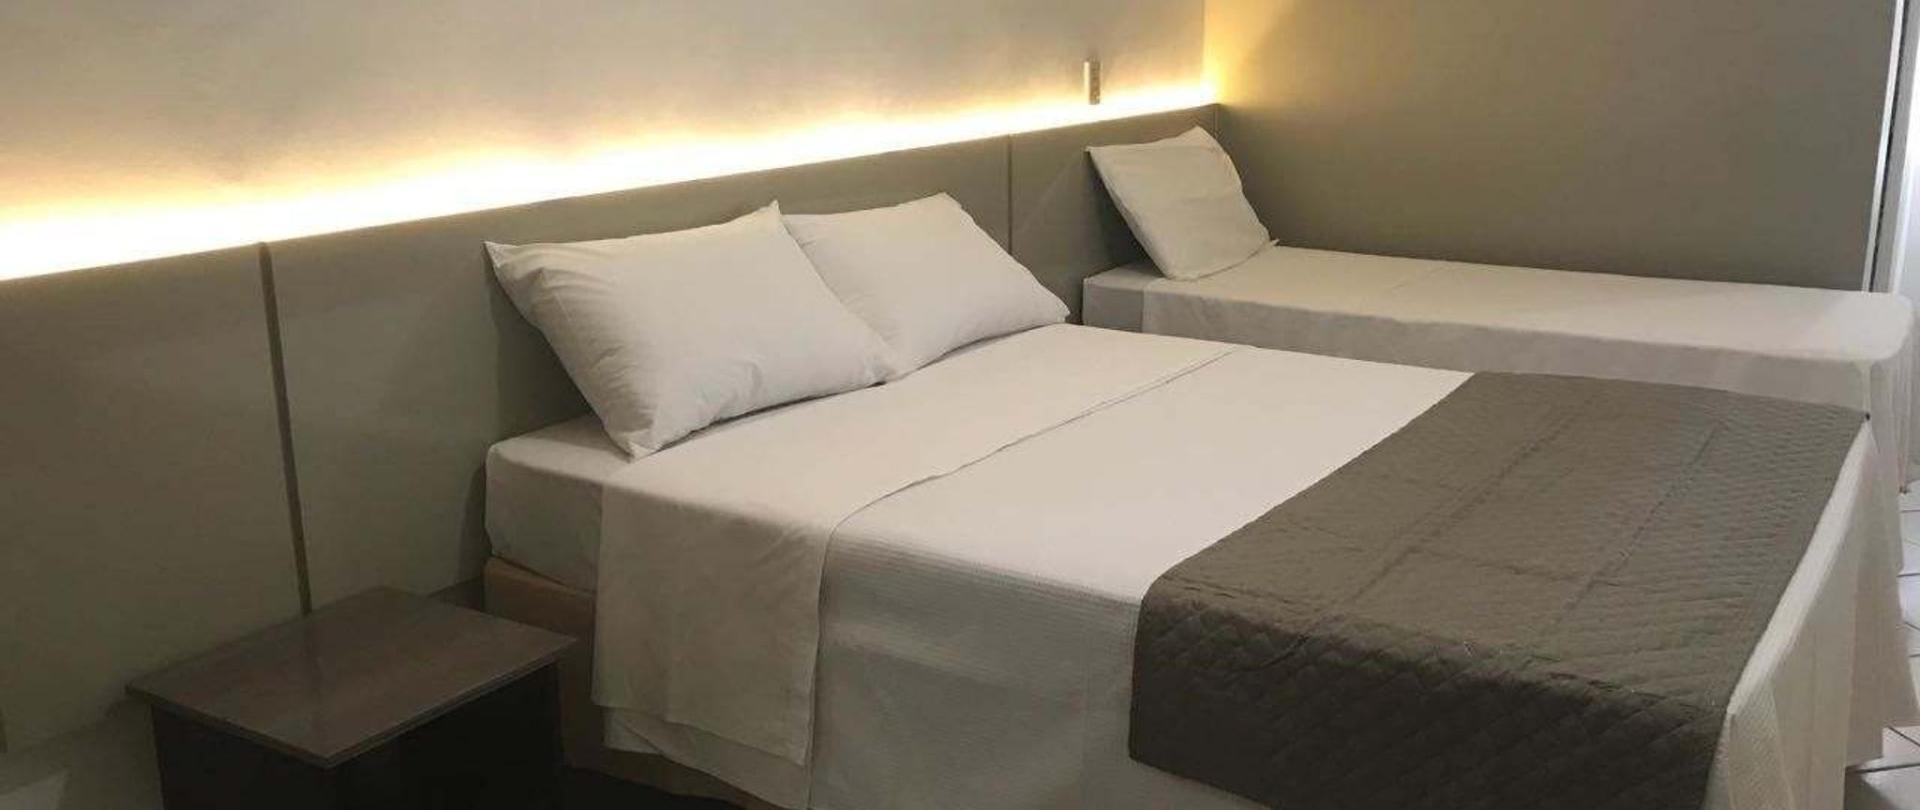 apartamento-cama-casal-e-solteiro-1.jpeg